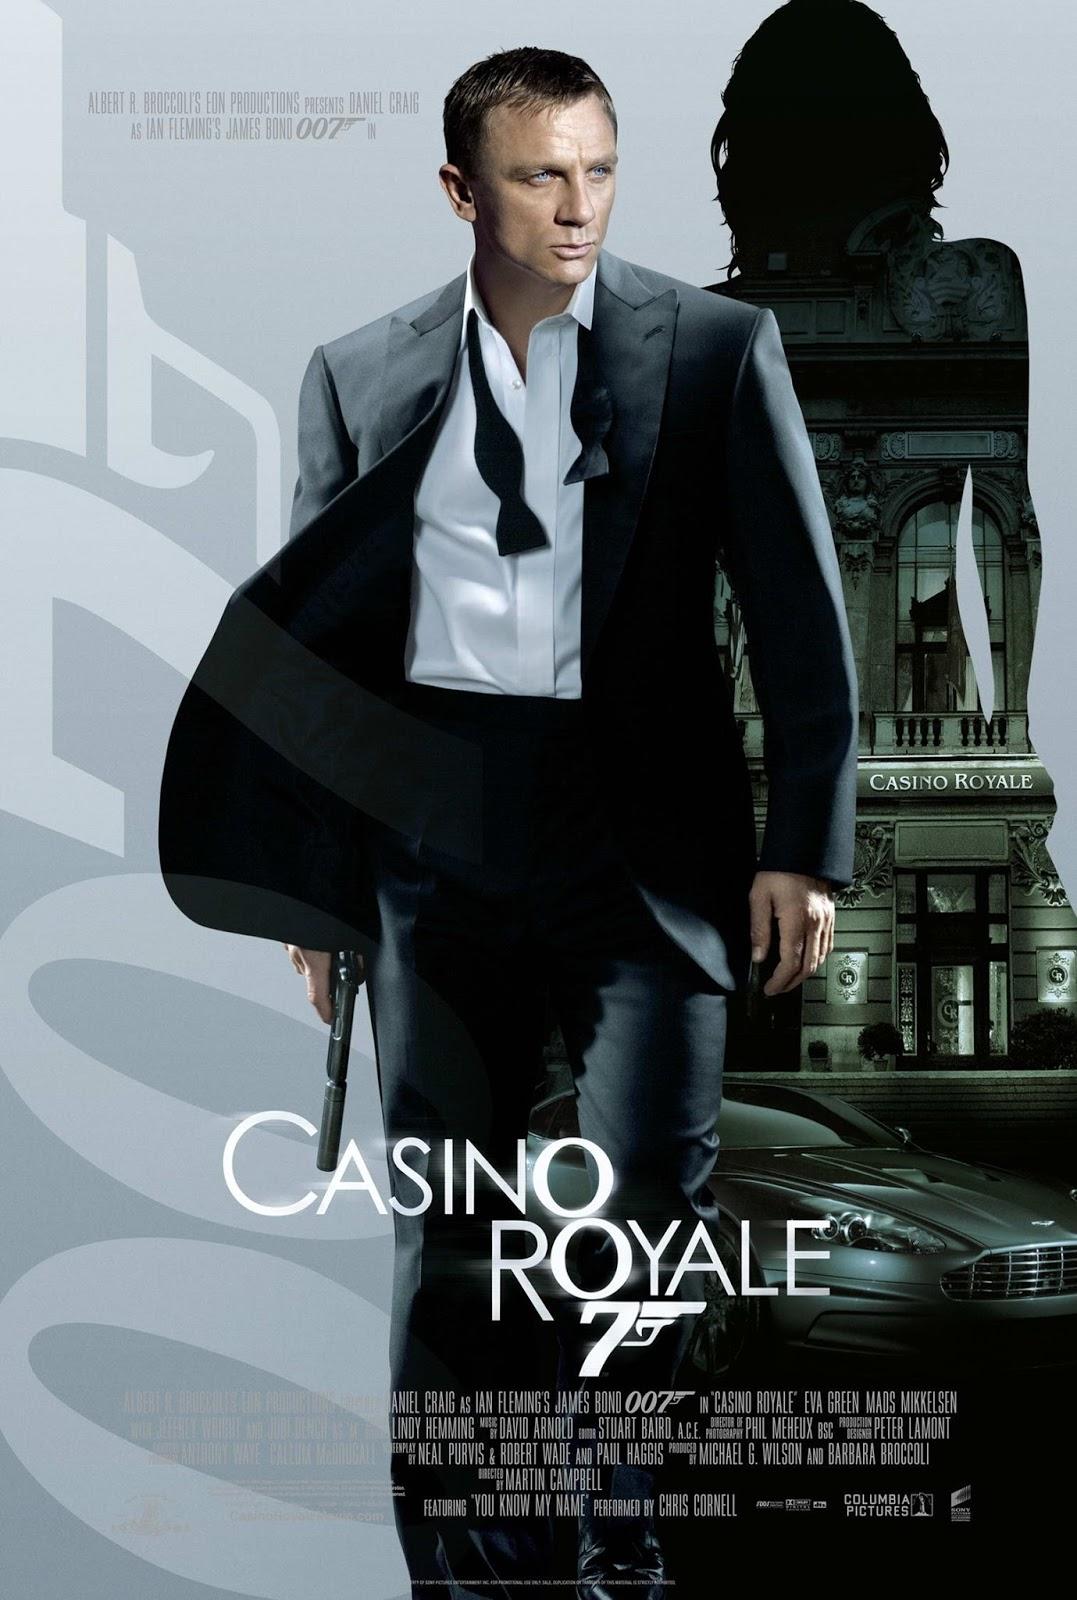 James Bond 007 Casino Royale เจมส์ บอนด์ พยัคฆ์ร้ายเดิมพันระห่ำโลก [HD][พากย์ไทย]